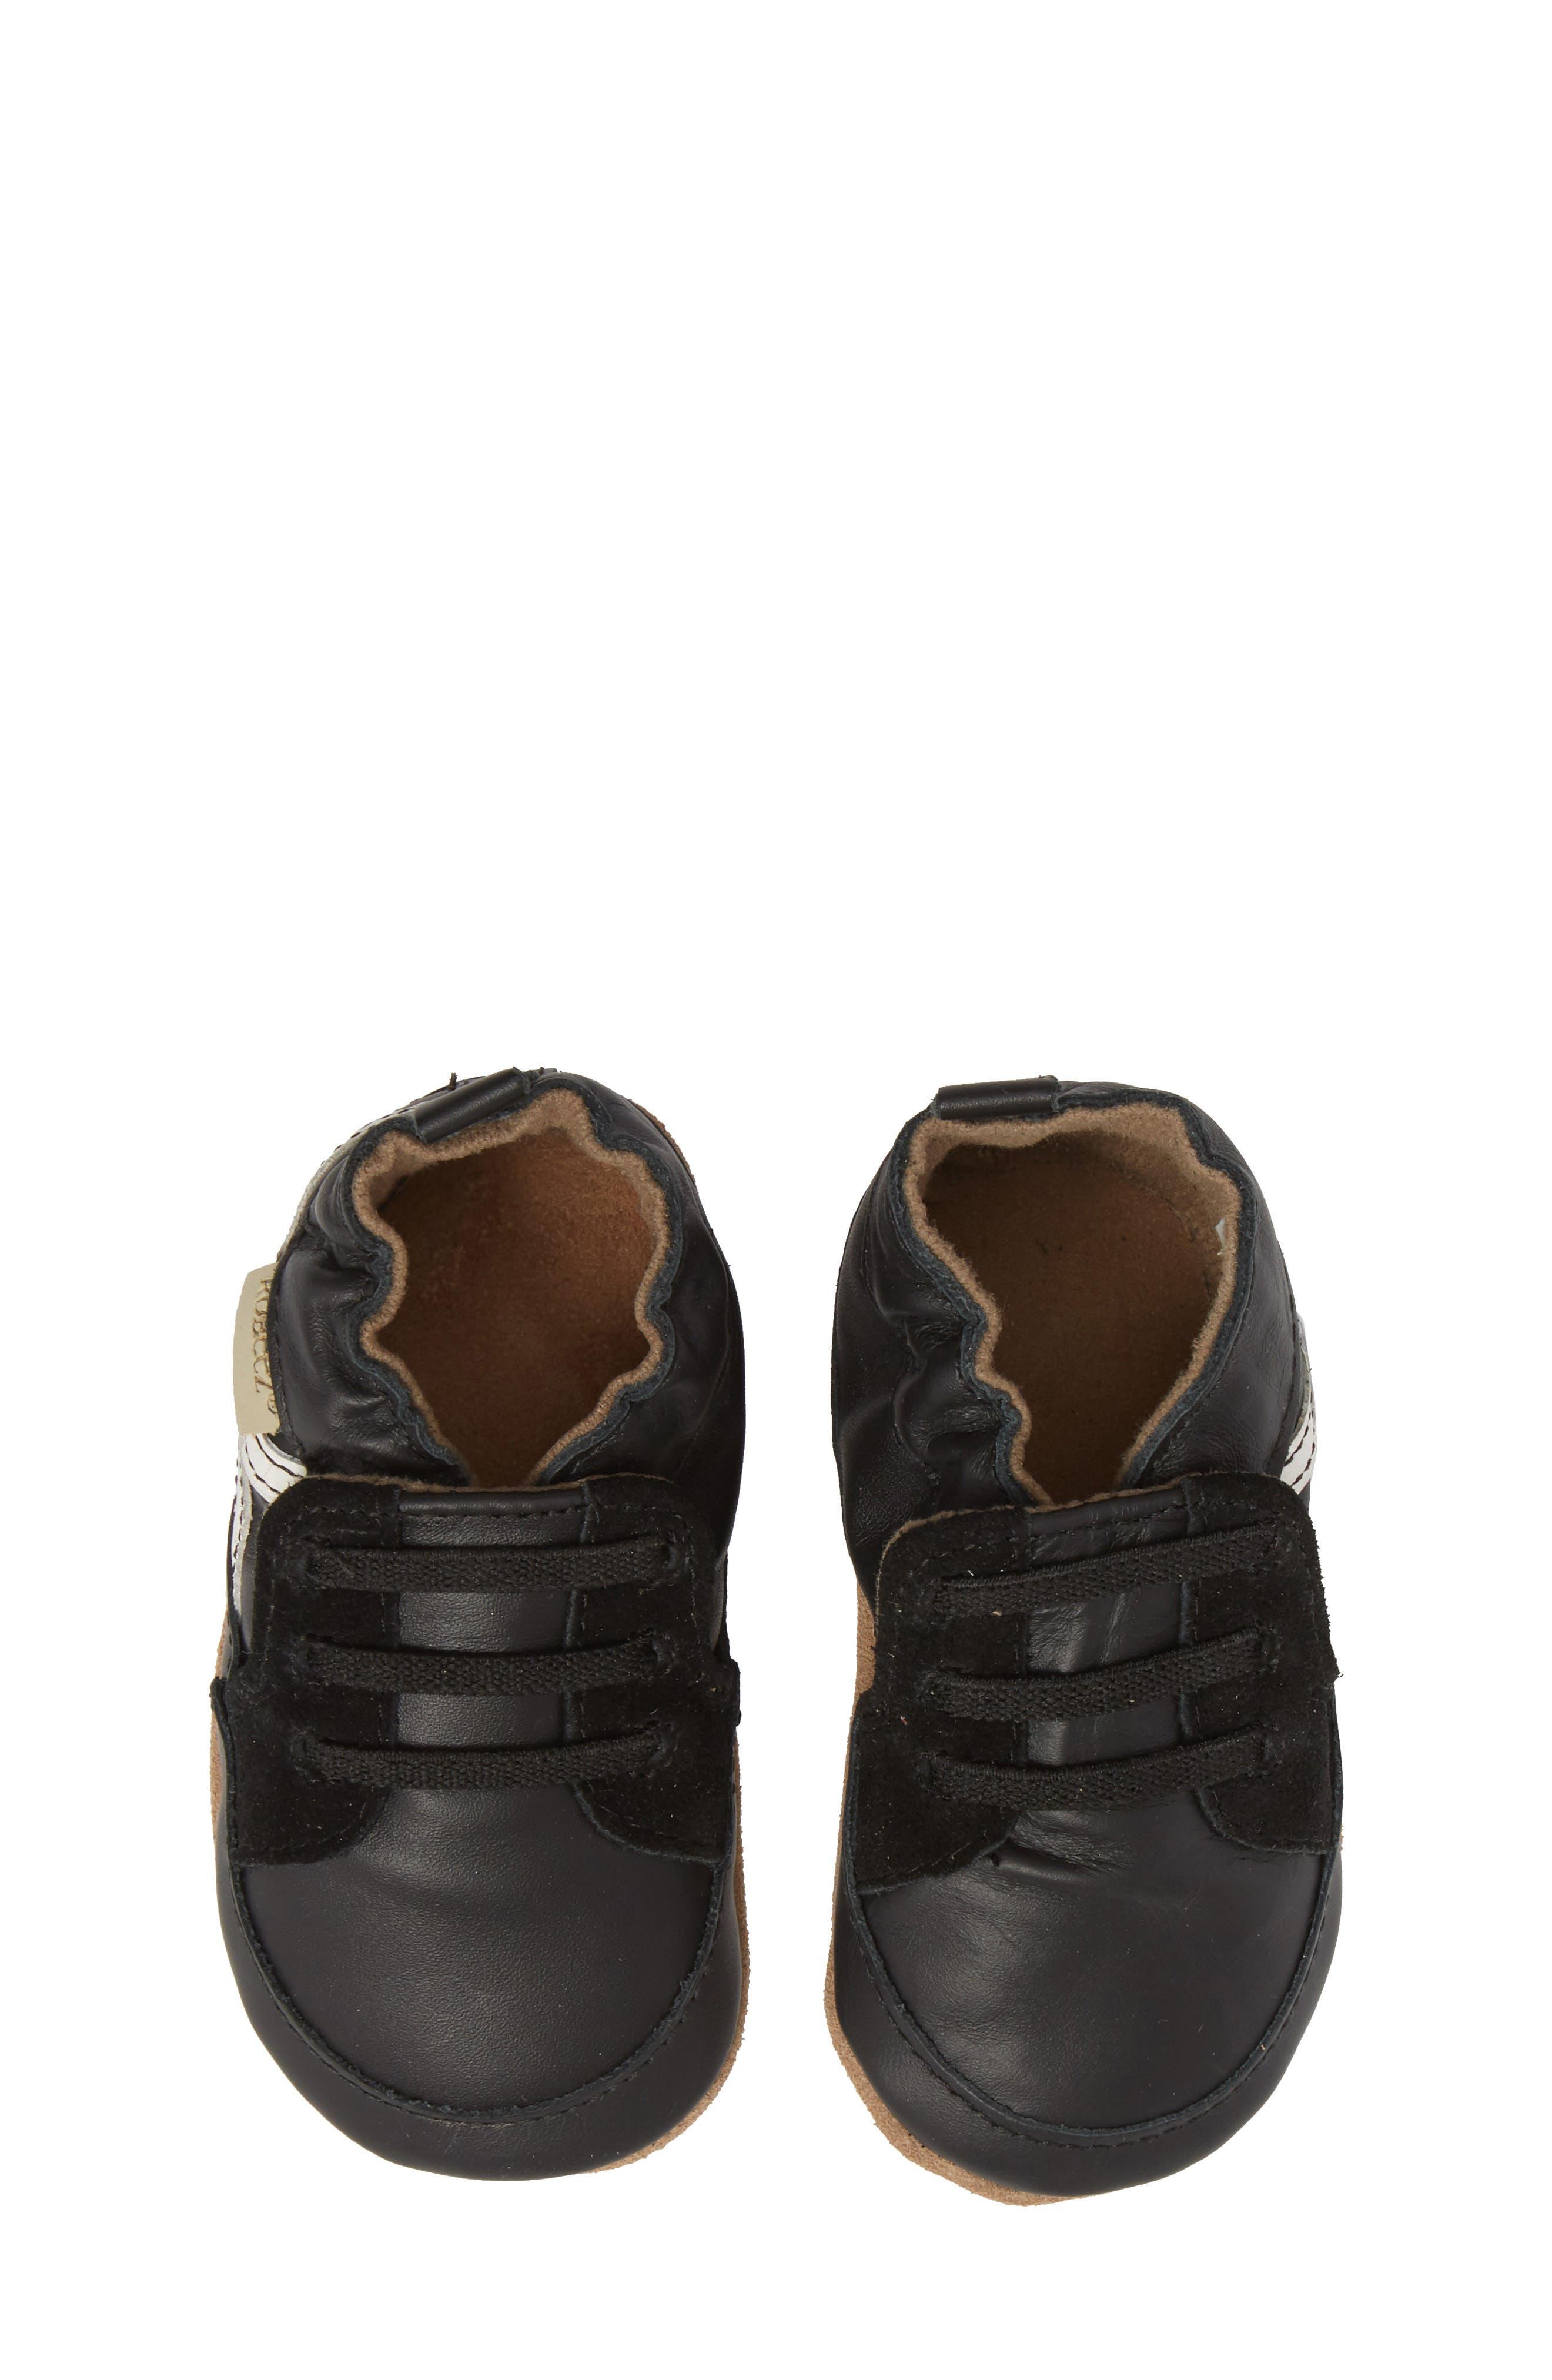 Super Sporty Sneaker Crib Shoe,                             Alternate thumbnail 5, color,                             BLACK